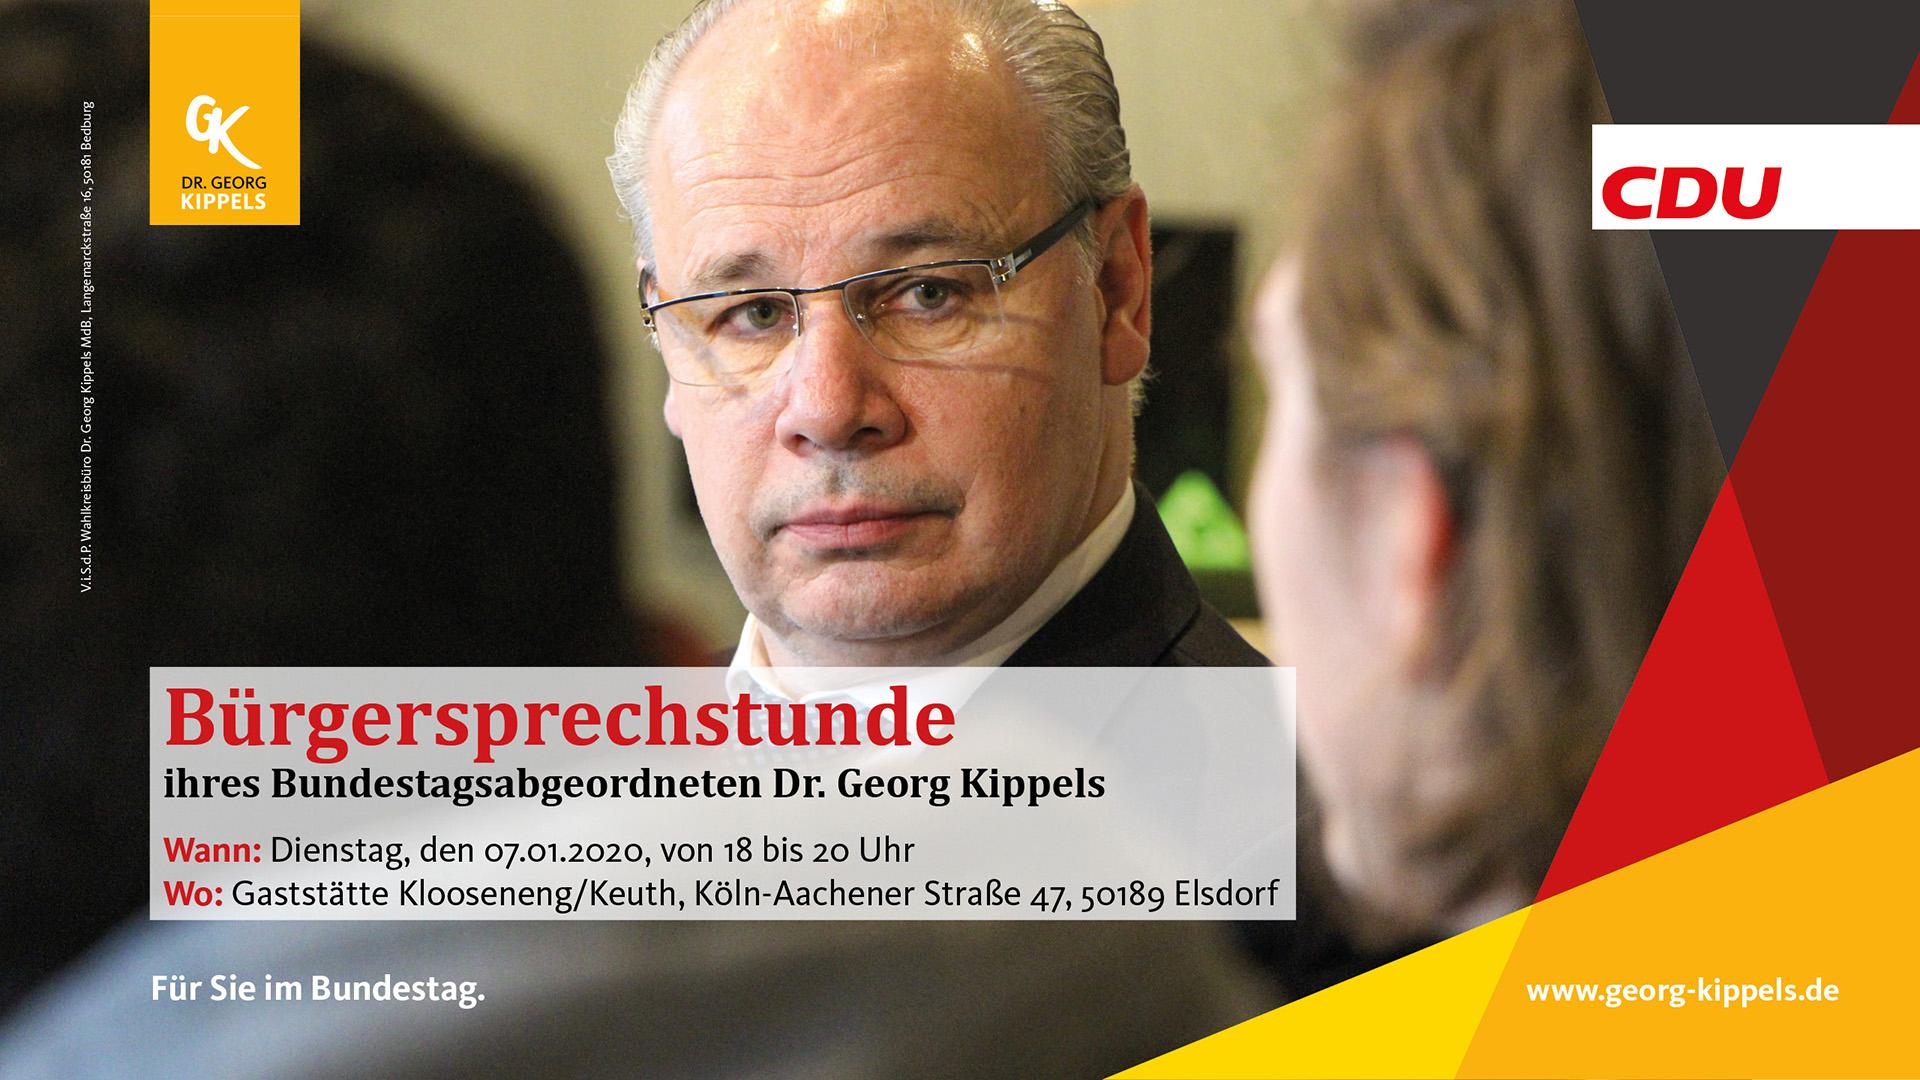 Bürgersprechstunde in Elsdorf am 07.01.2020